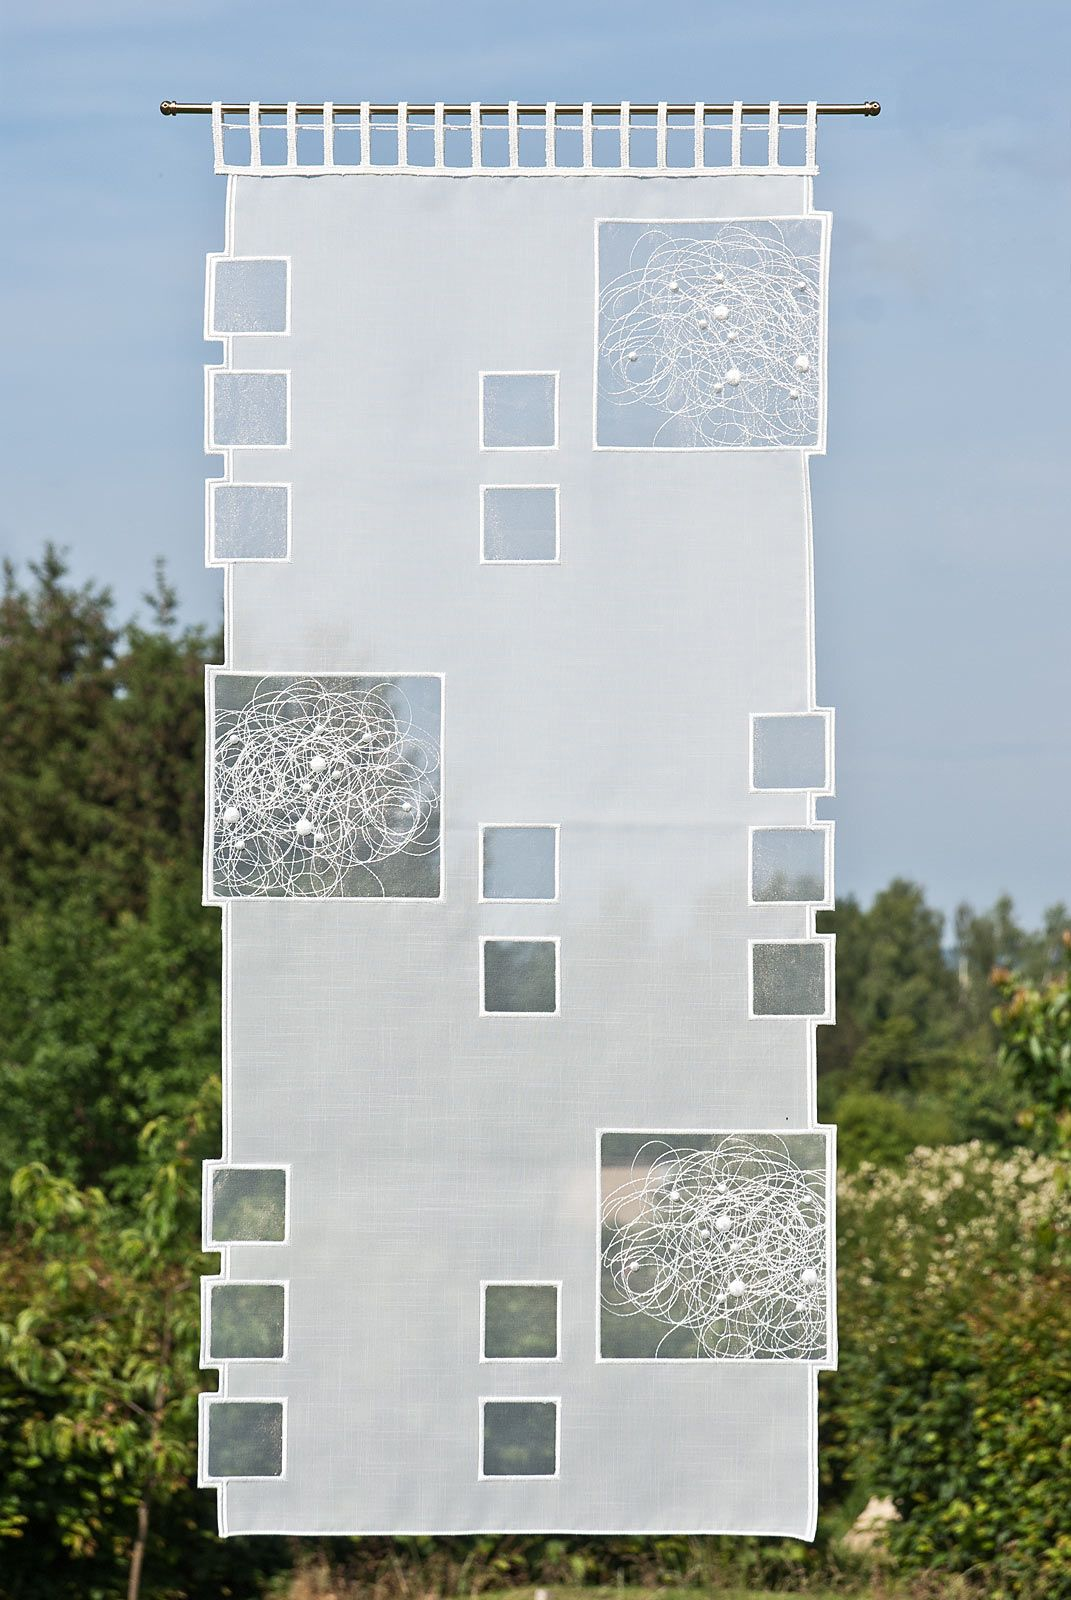 Flächenvorhänge Modern mixing sheers with opaques flächenvorhänge modern günstige